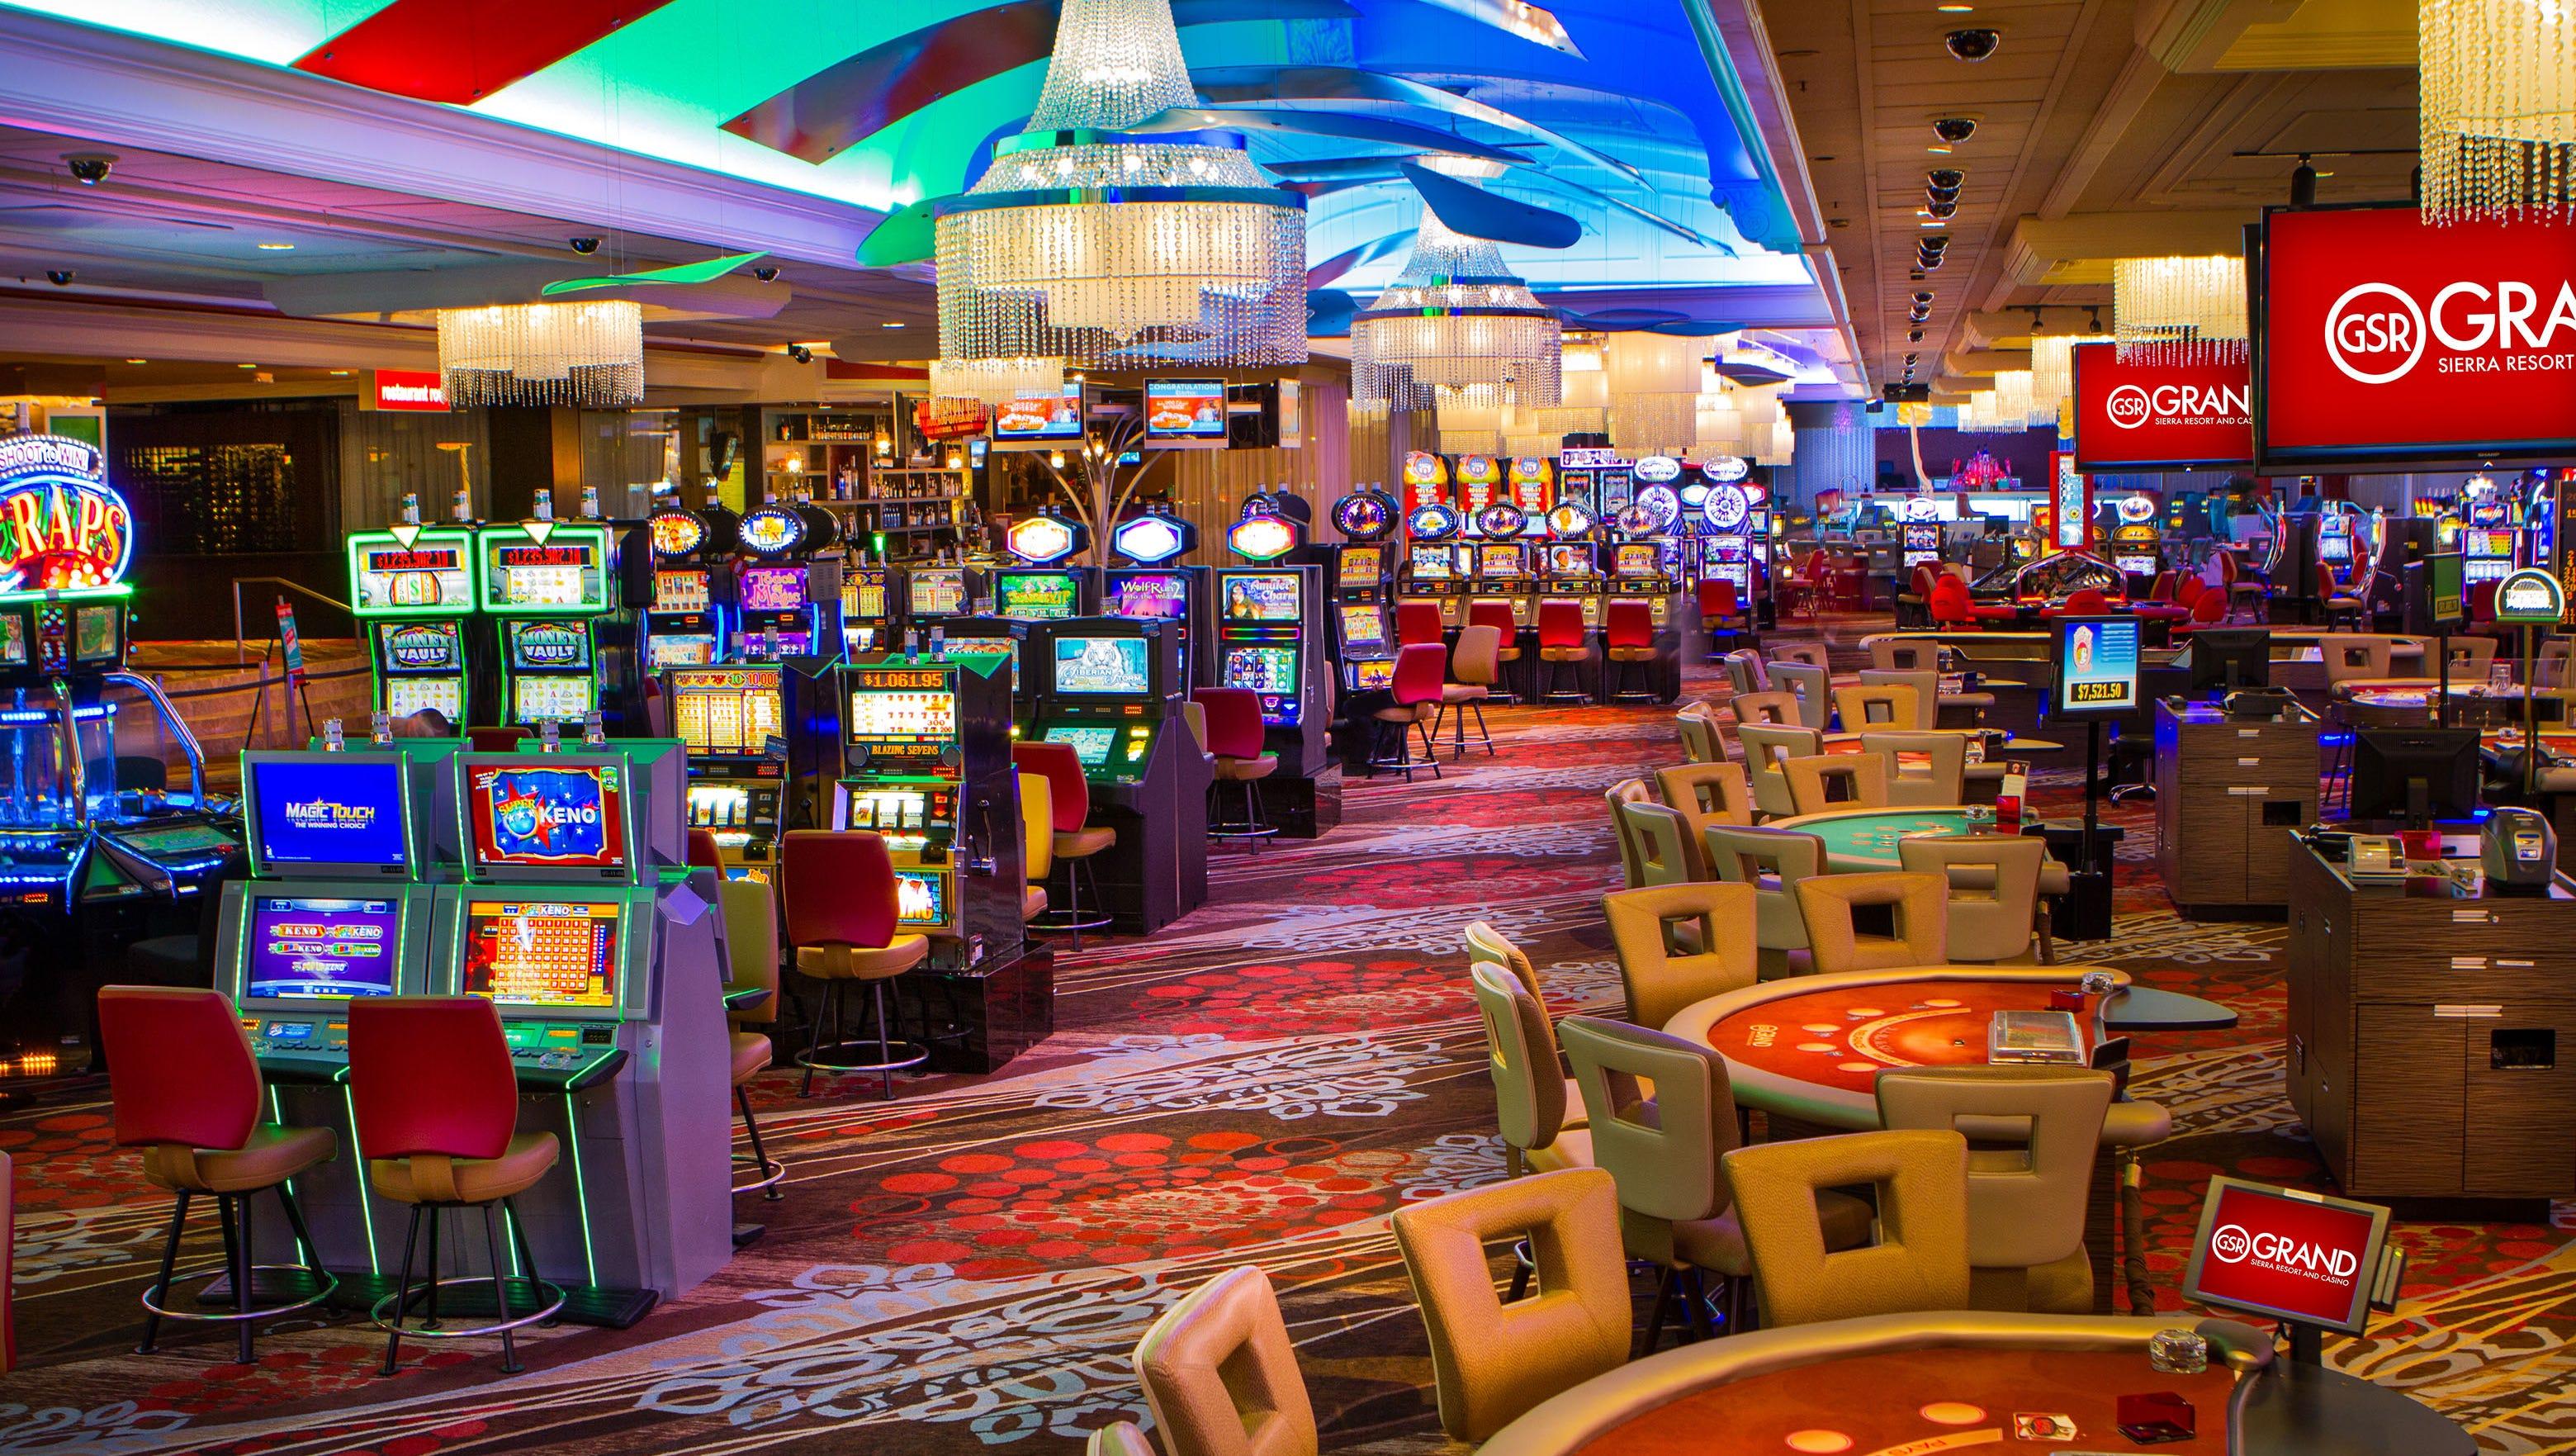 Highsierra hotel and casino reno nv cht egt instrument